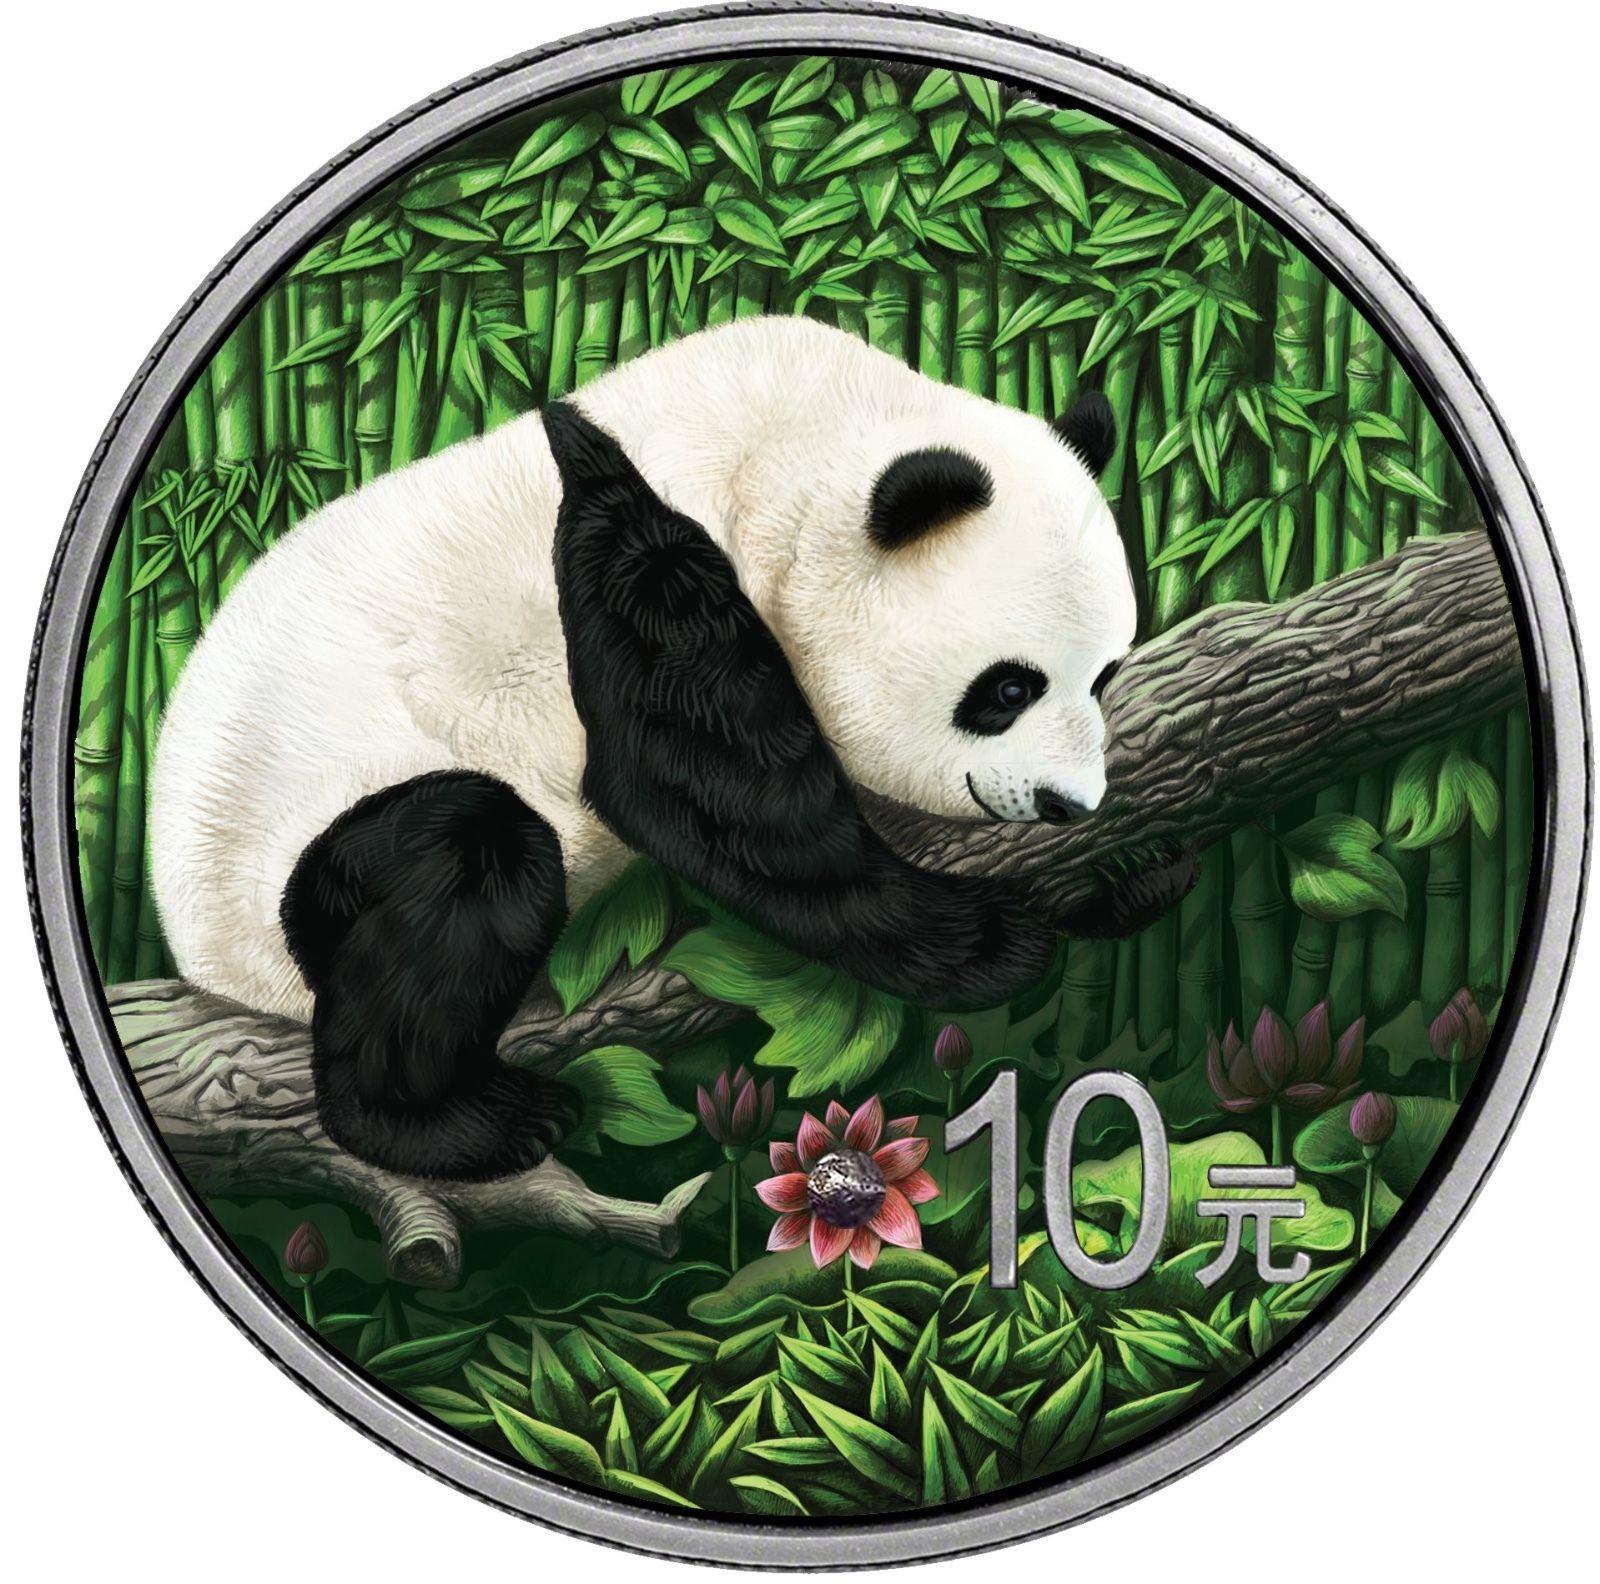 Ounce of Space - Panda - with Nantan Meteorite